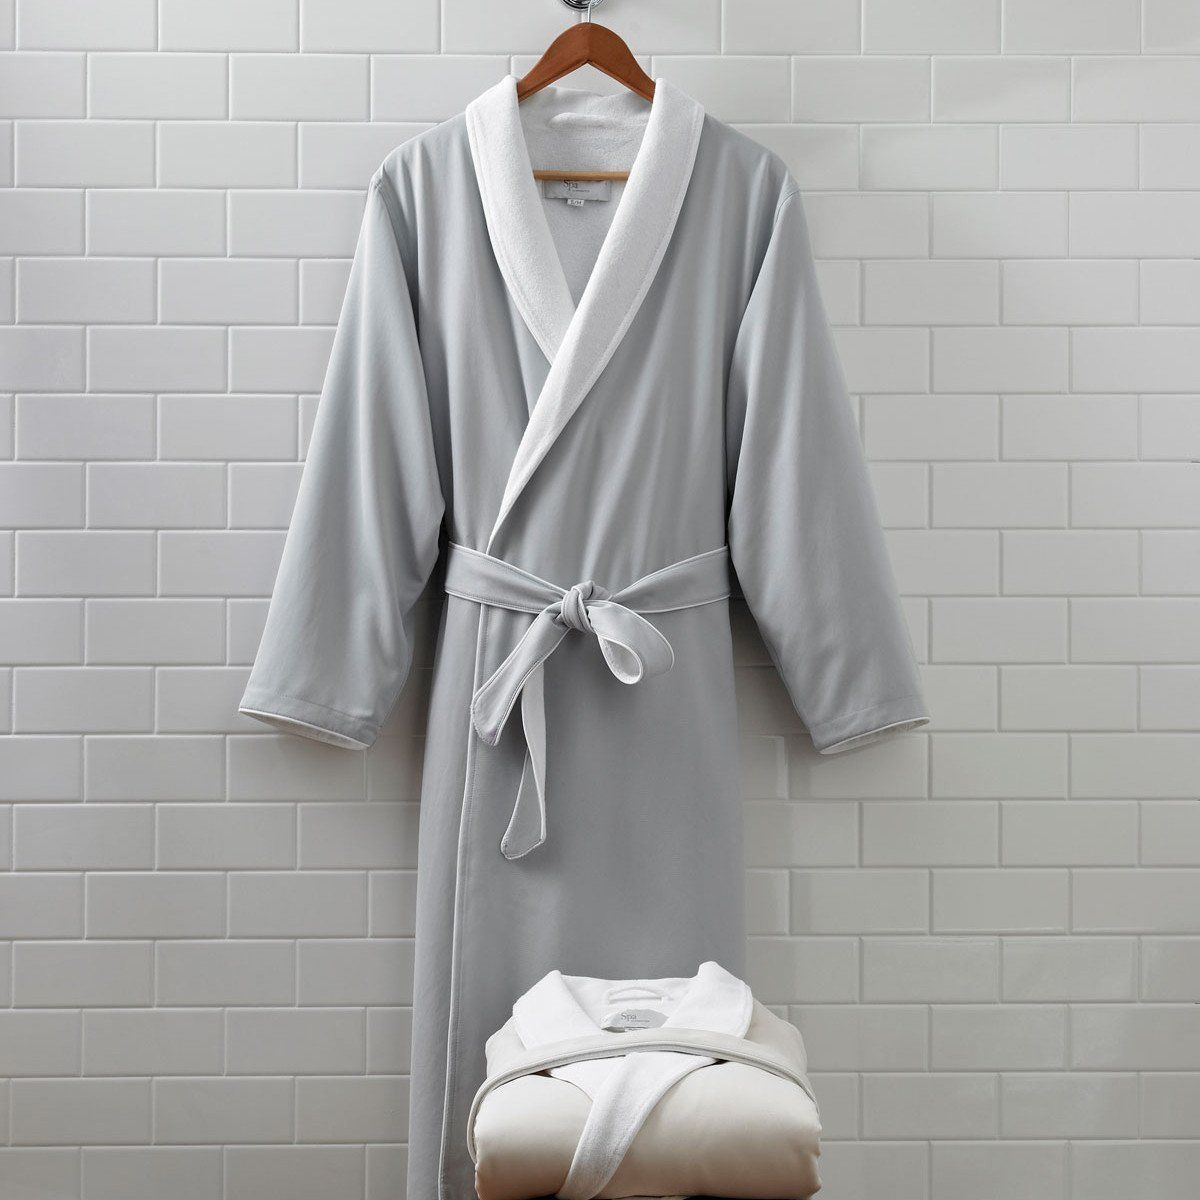 a2469fd0fb ST. Tropez Signature Spa Robe